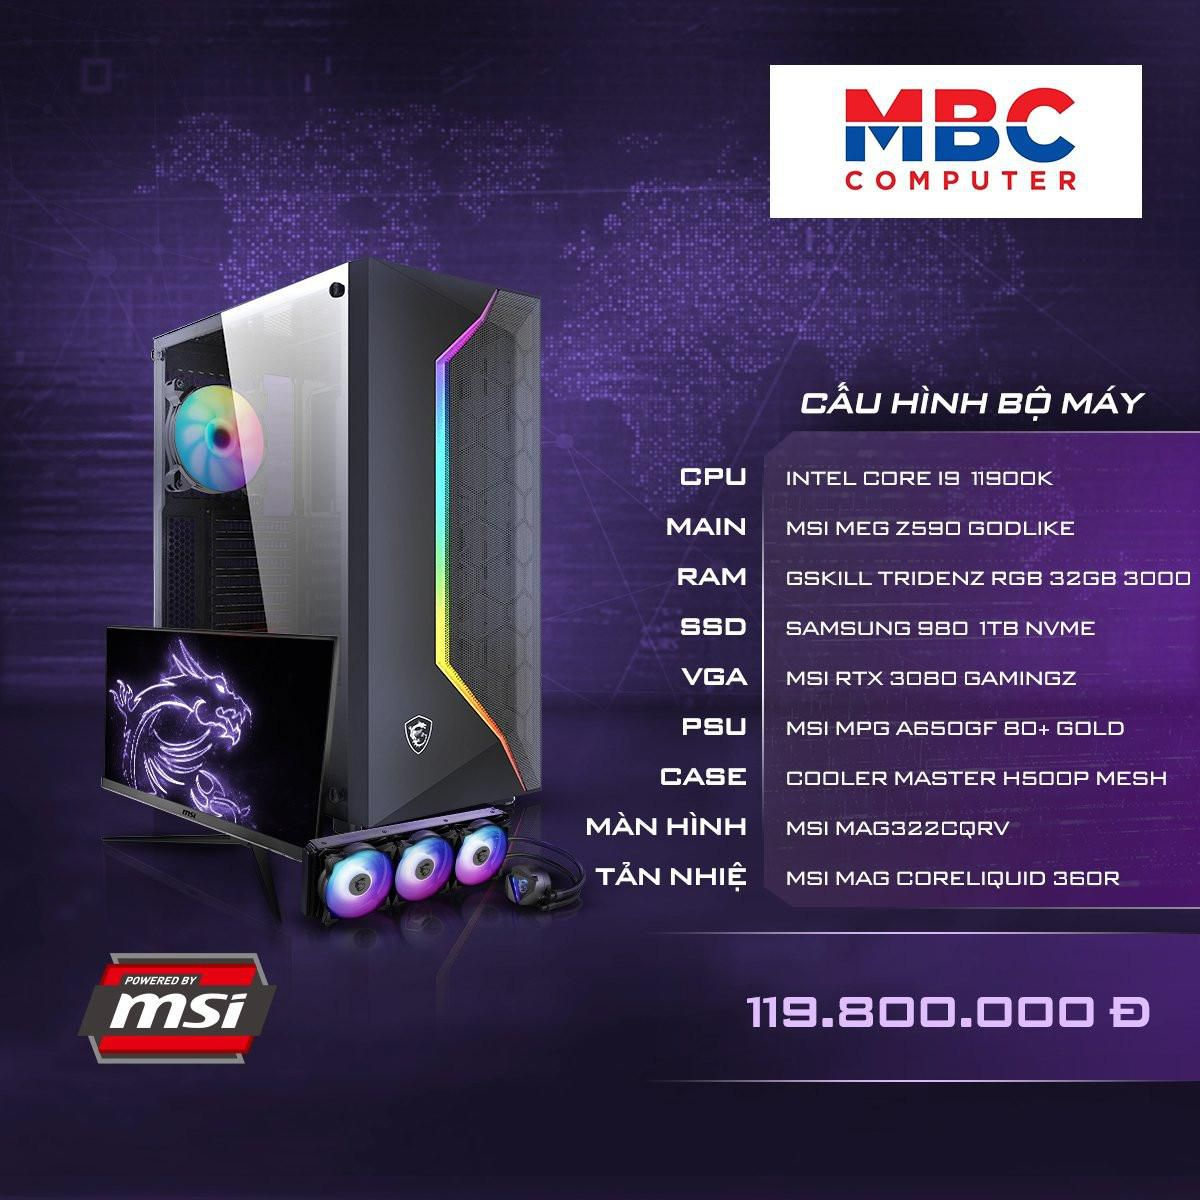 PC GAMING (Z590/I9 11900K/32GB RAM/SSD 1TB NVME/VGA 3080 GAMINGZ)